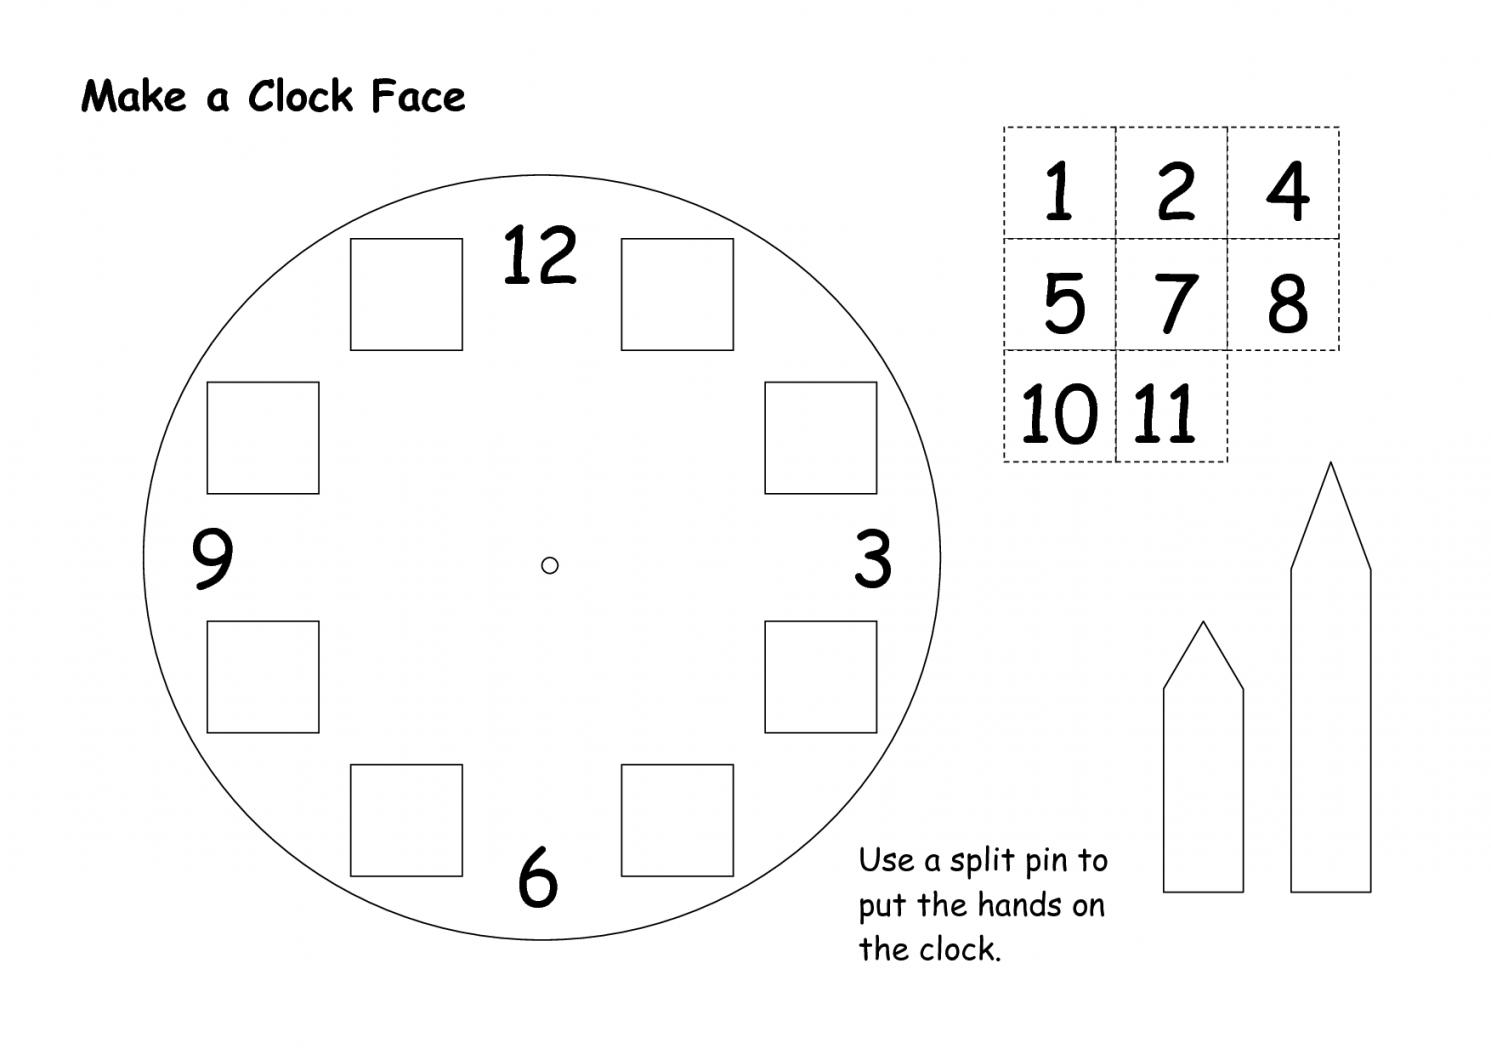 Ins Pi Re Math Make Your Own Class Set Of Clocks Von Make Your Own Clock Photo Haus Design Ideen